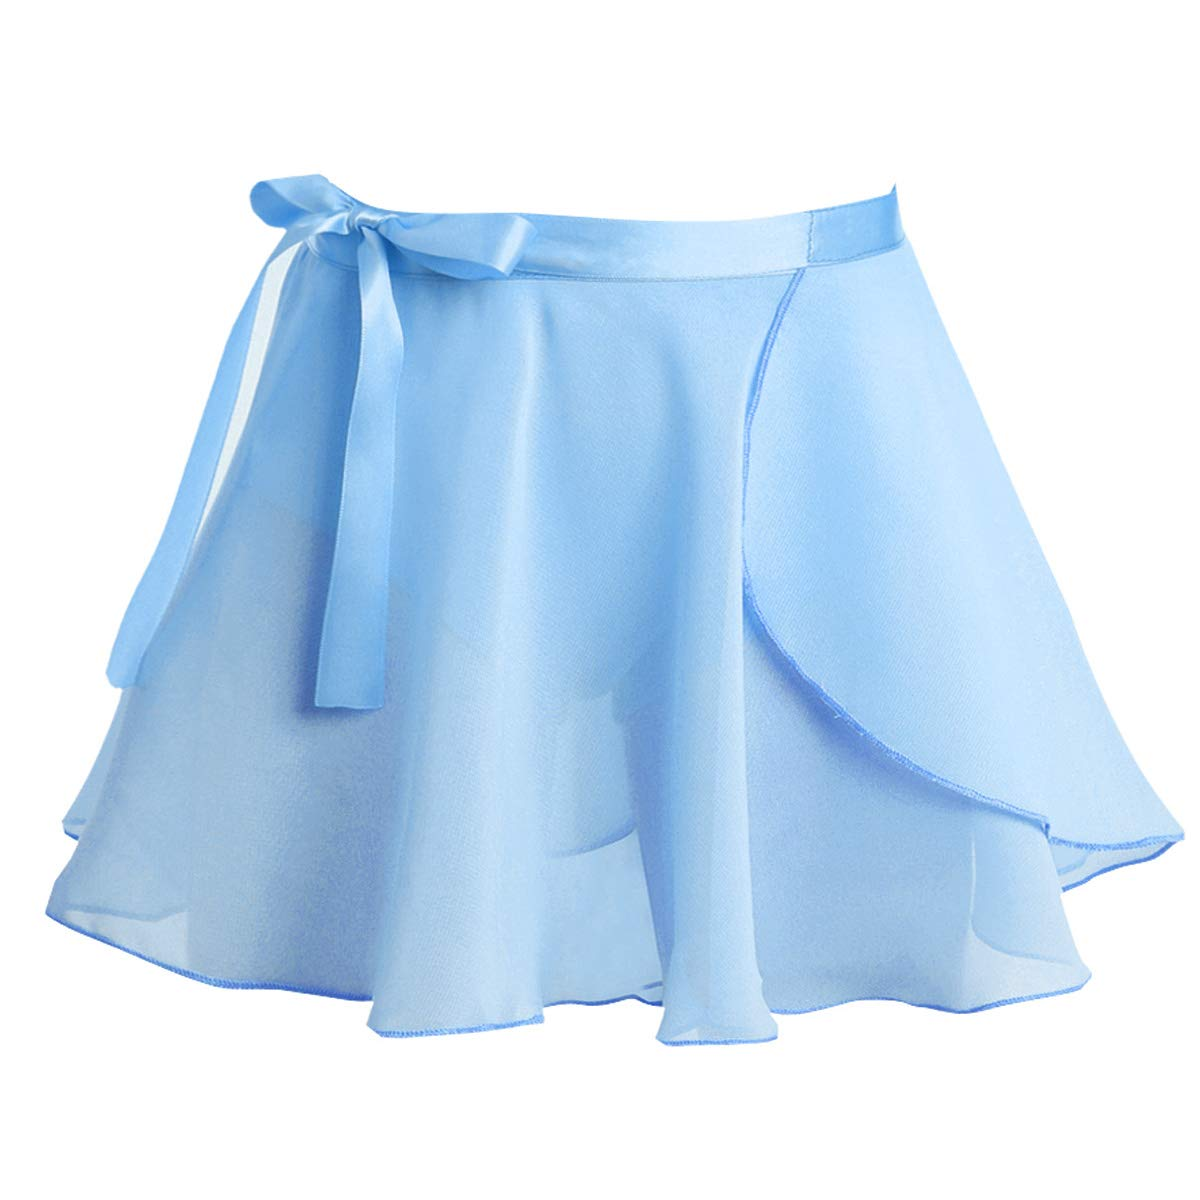 TiaoBug Girls' Ballet Wrap Skirt with Tie Waist Chiffon Basic Wrap Tutu Dancewear Costumes Light Blue 3-4